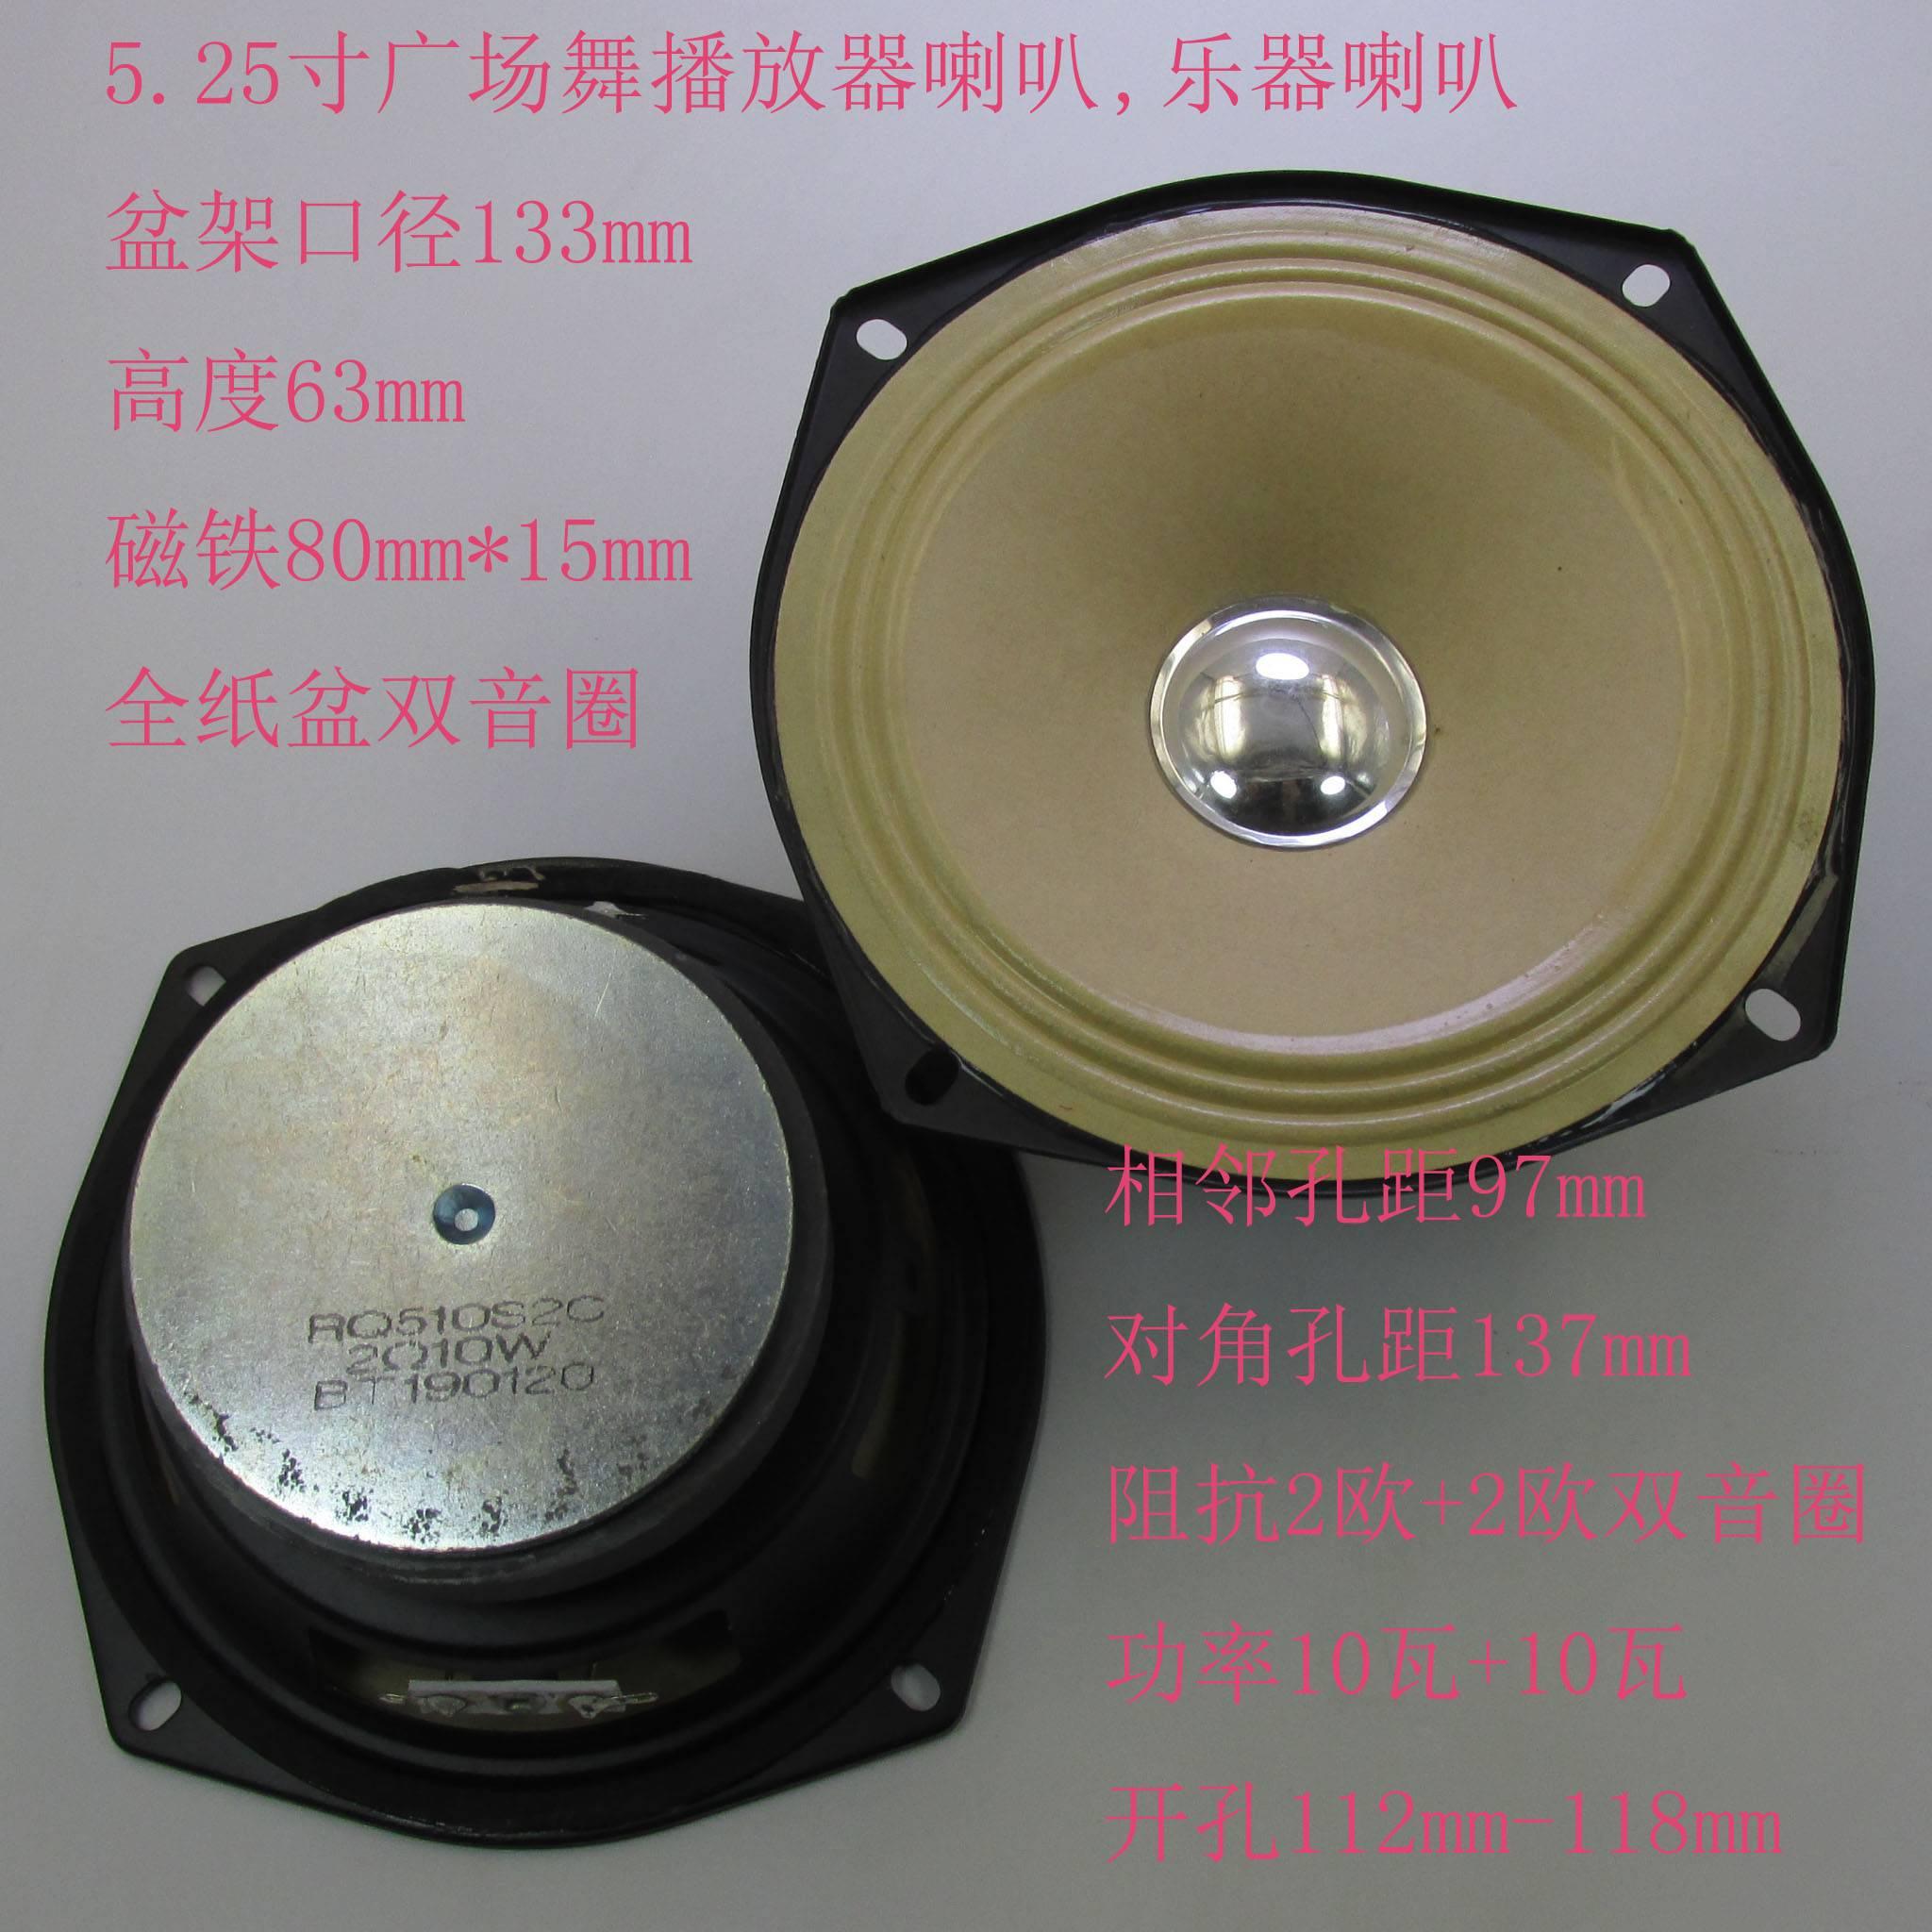 5.25 inch high and medium tone, instrument speaker, double voice coil, paper basin cloth edge, square dance speaker